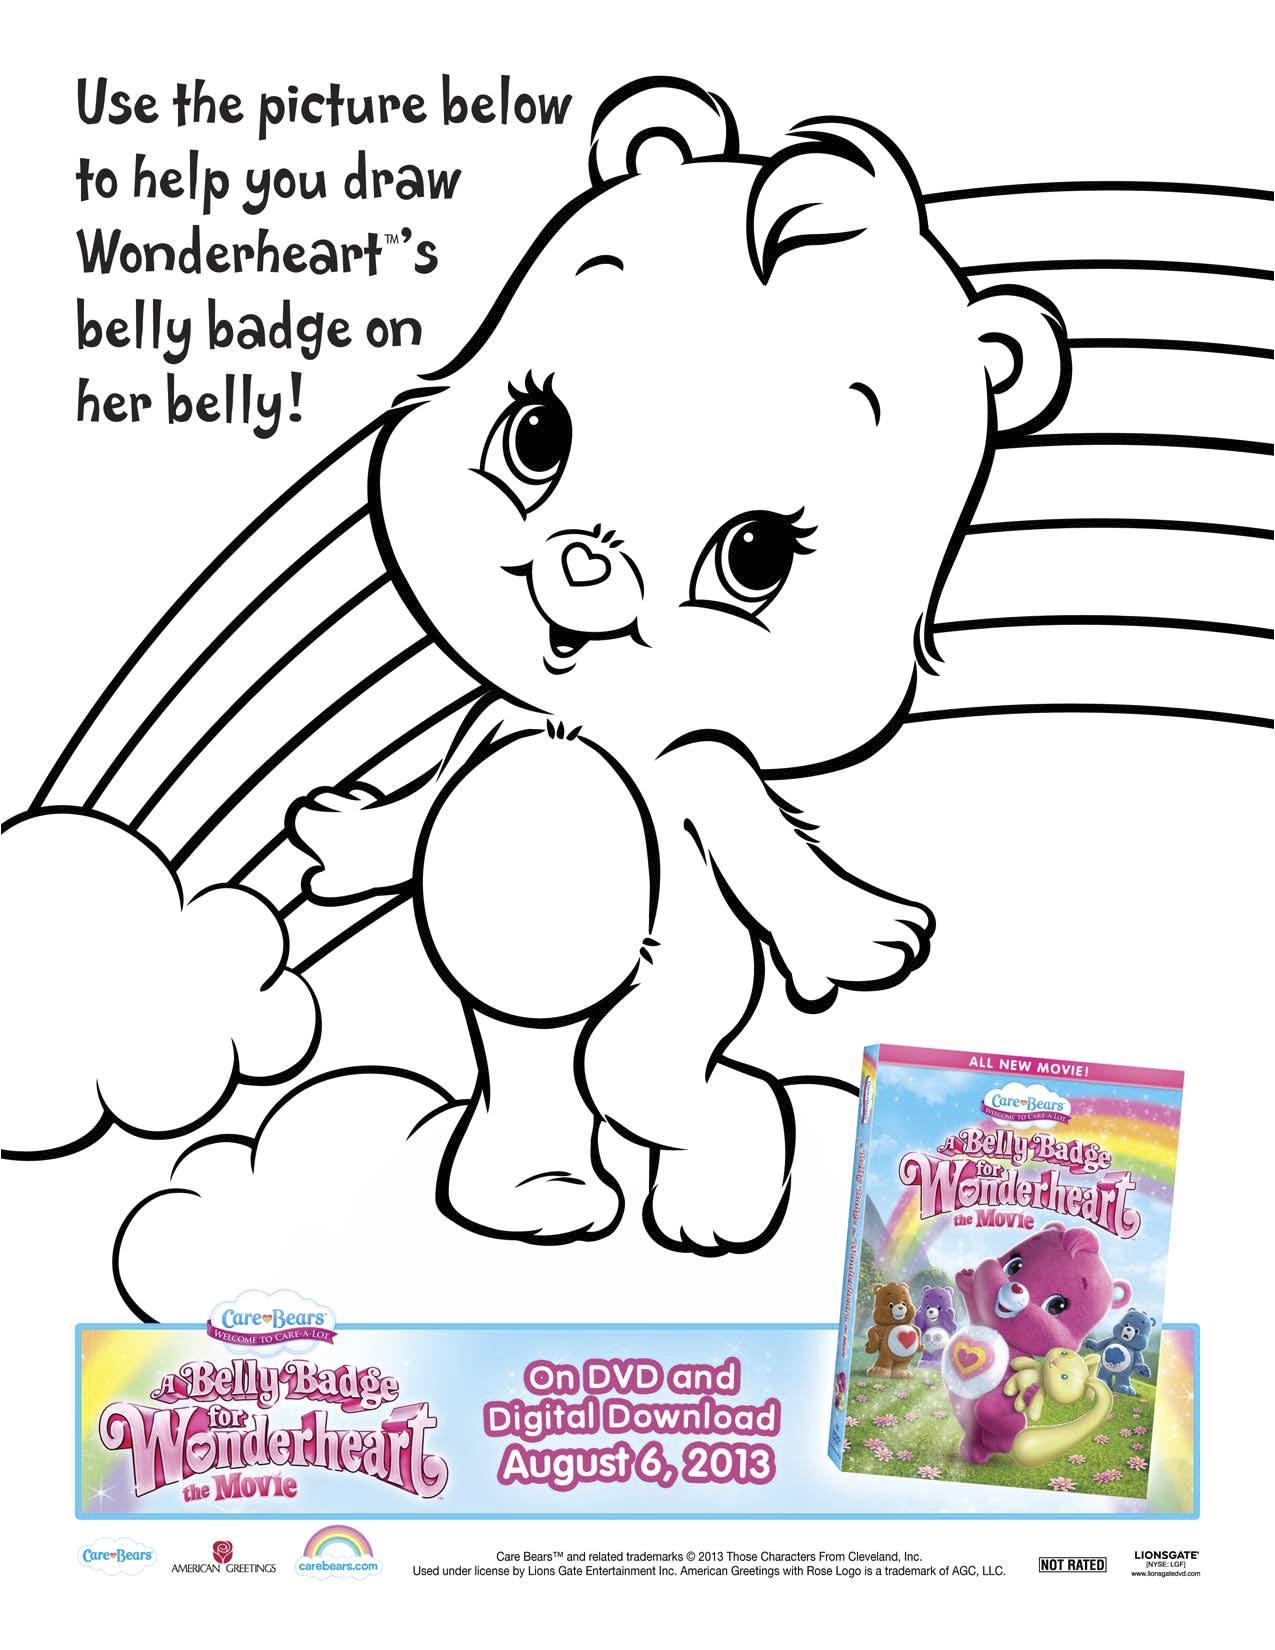 Care Bears A Belly Badge for Wonderheart